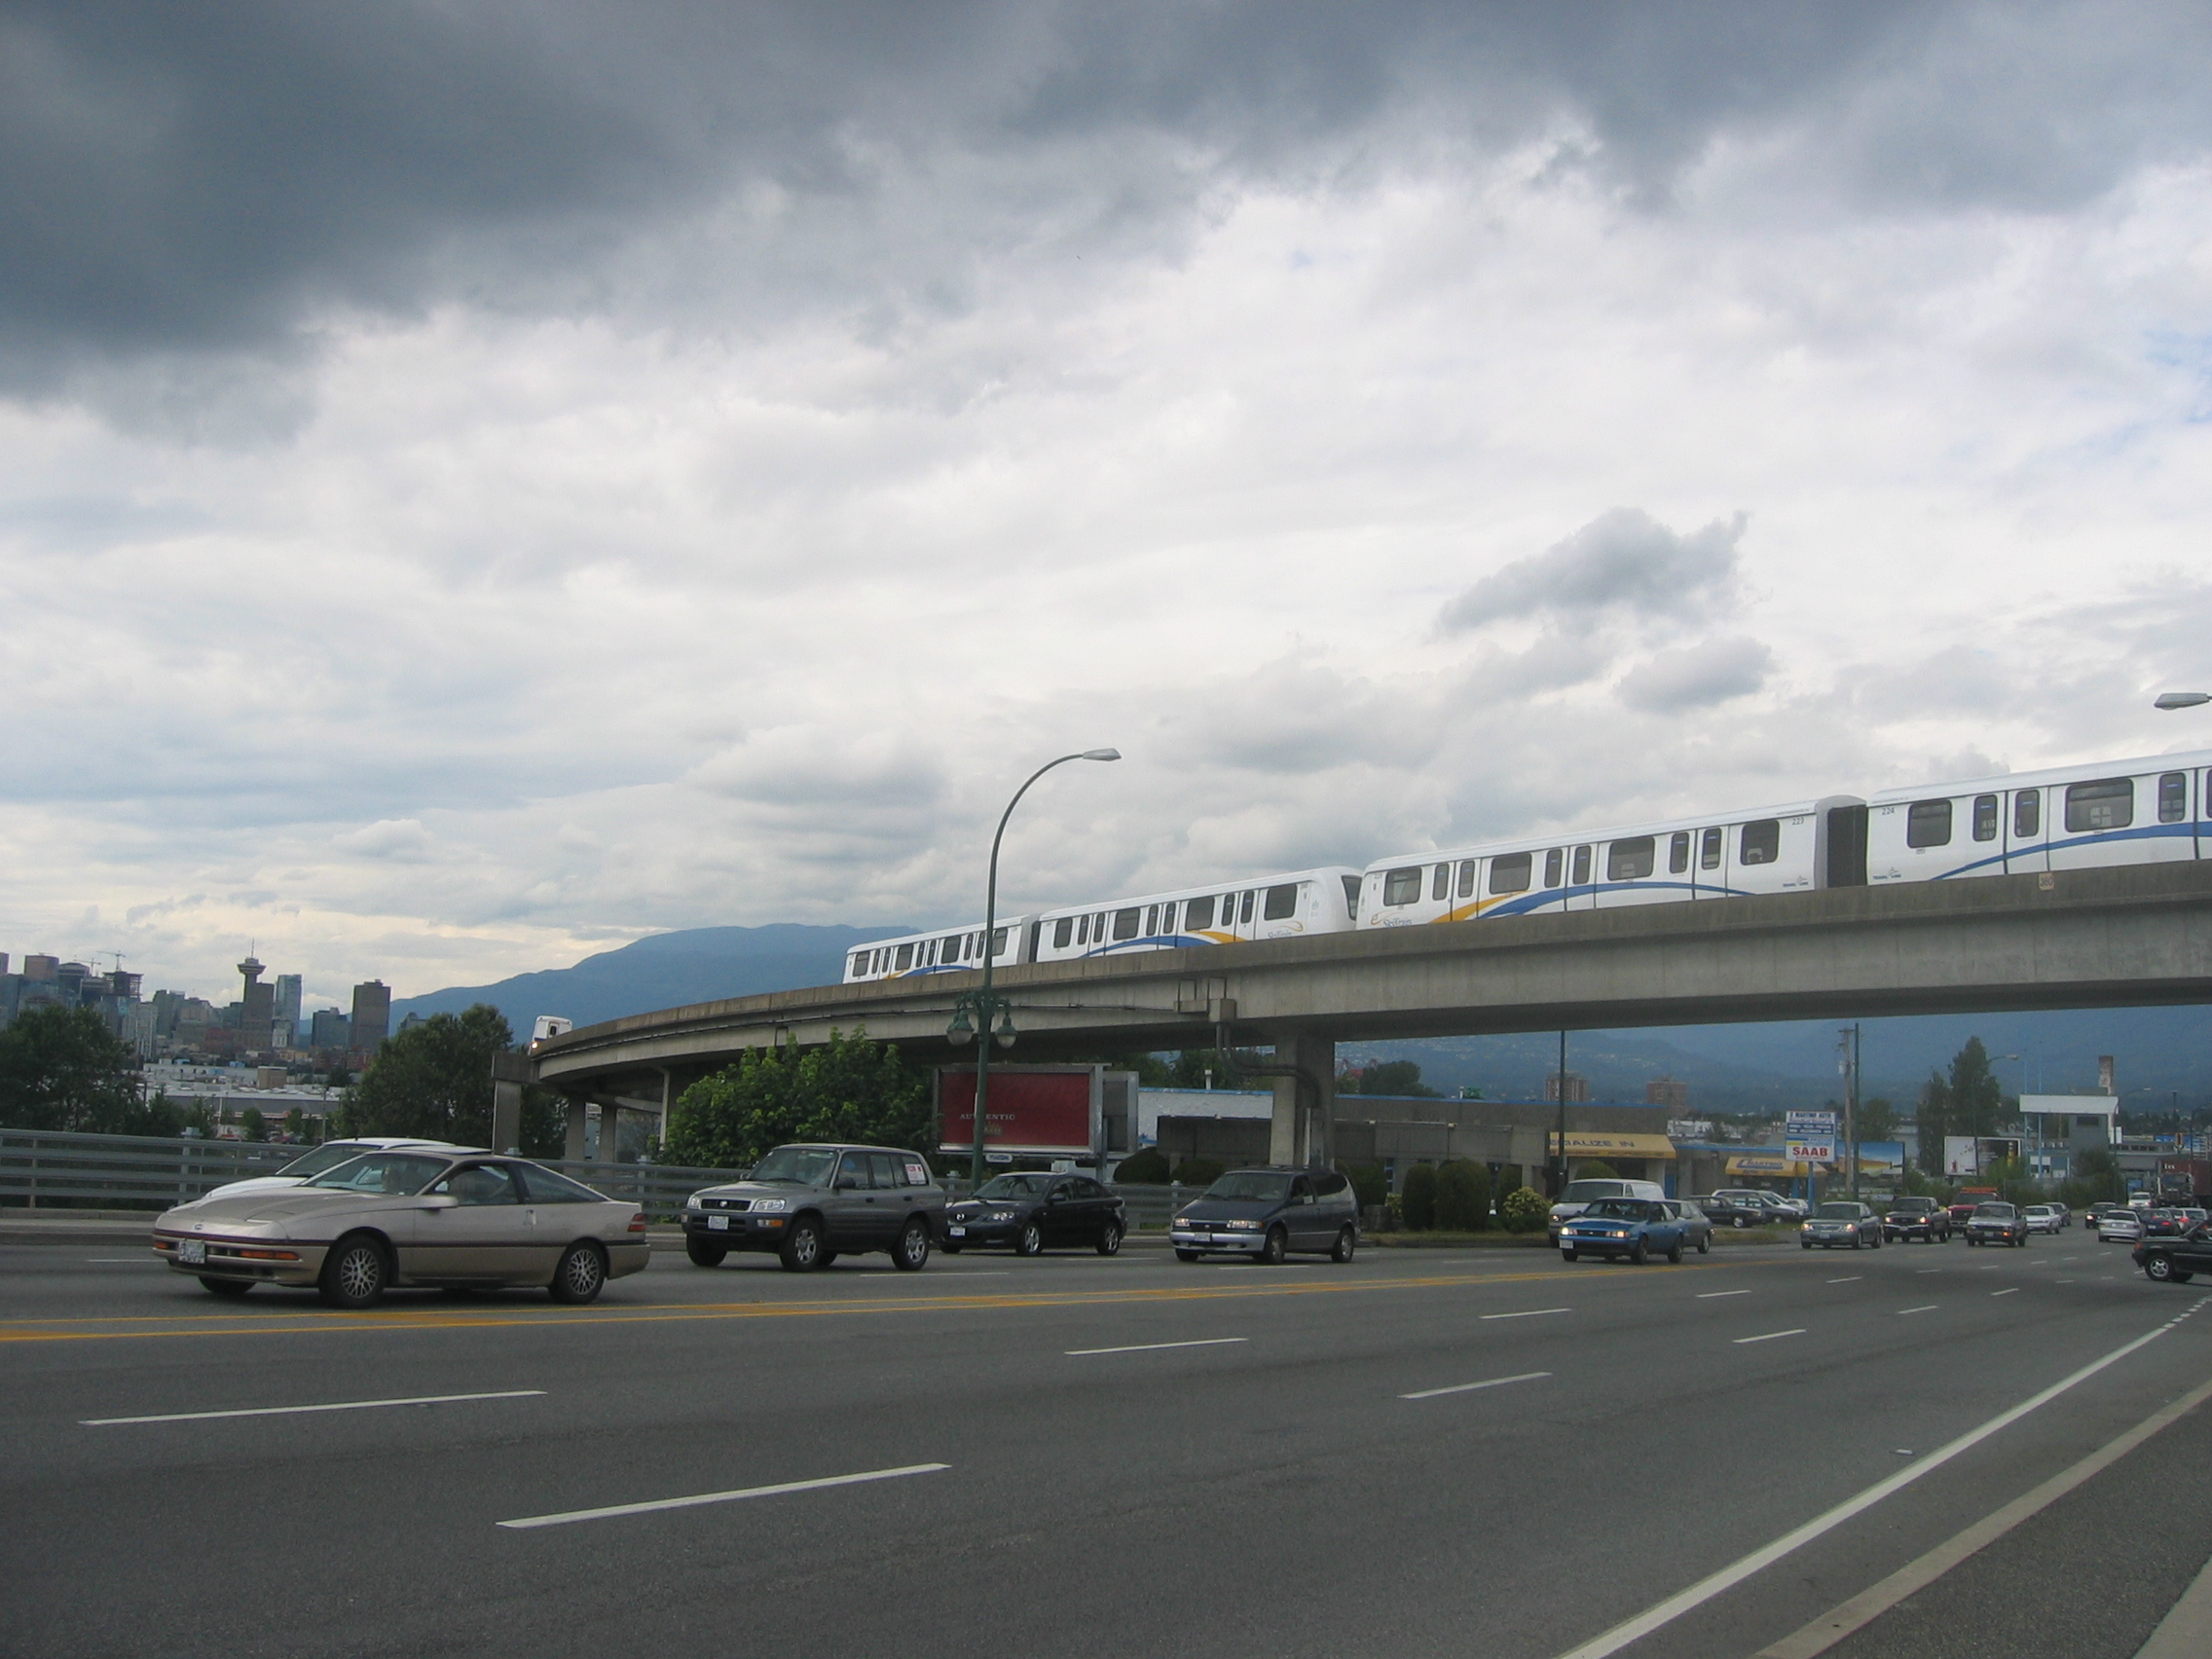 Vancouver translink bus-5979